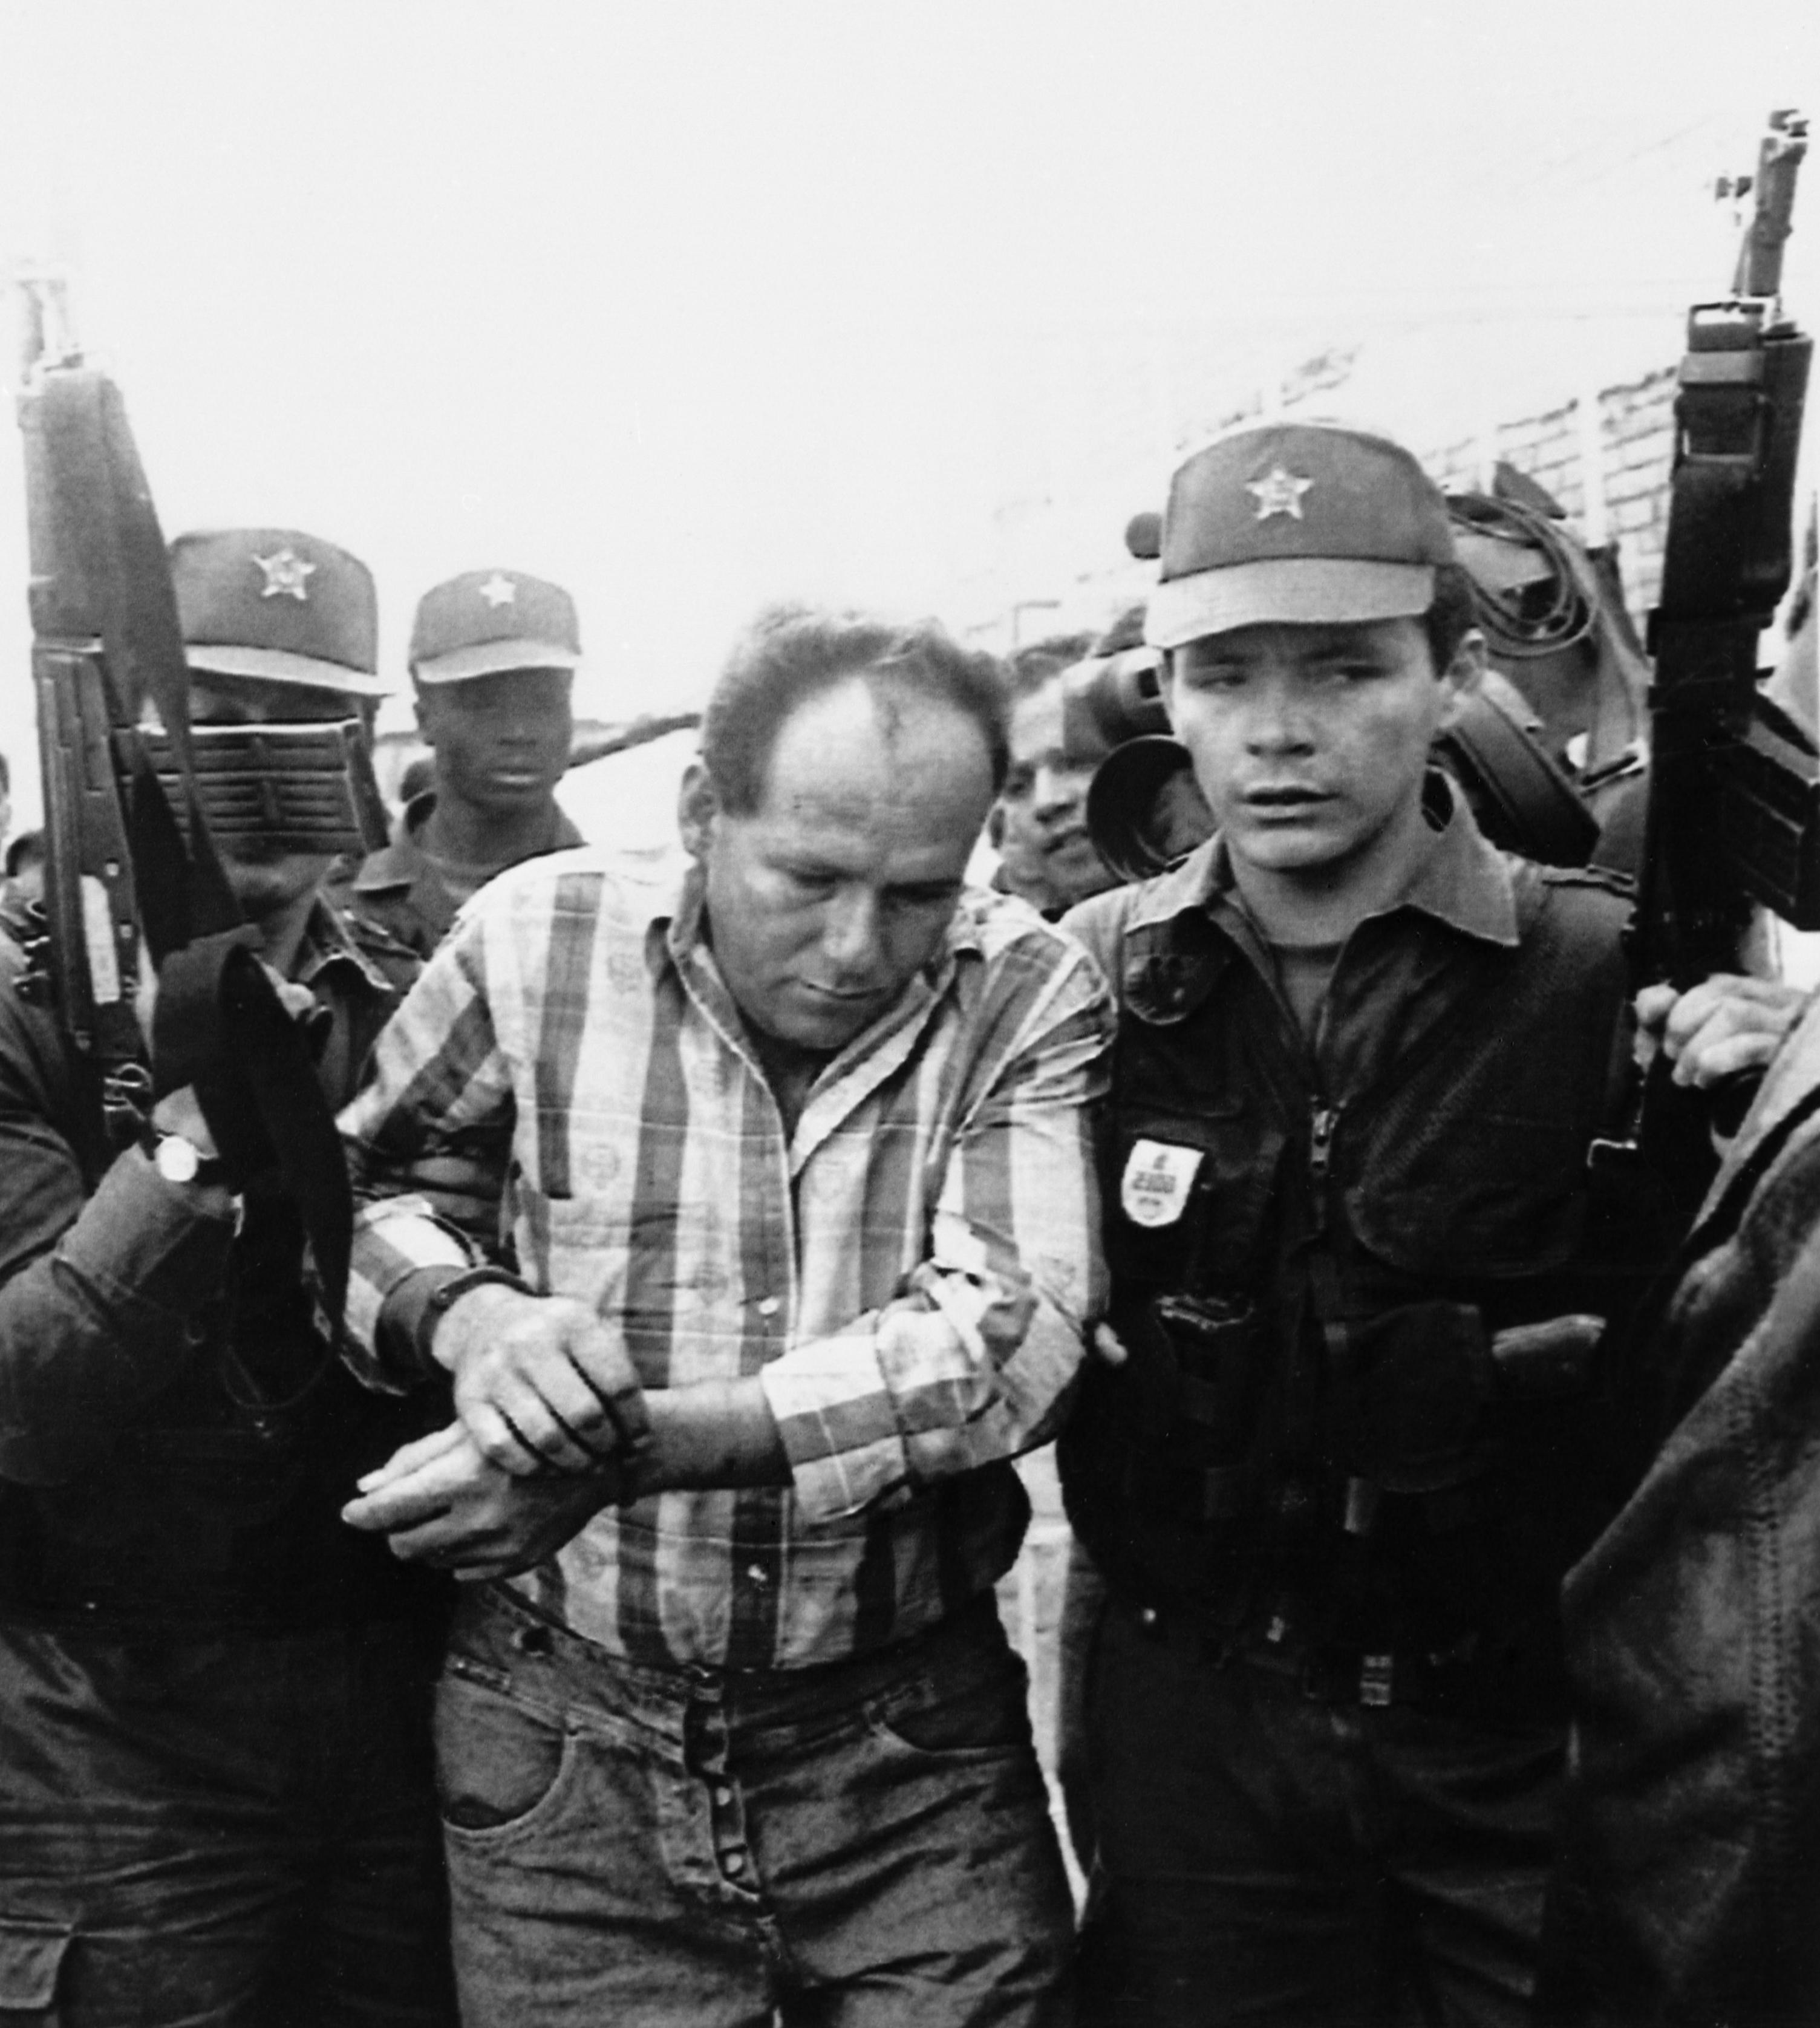 3 июля 1993. Арест Умберто Муньоса